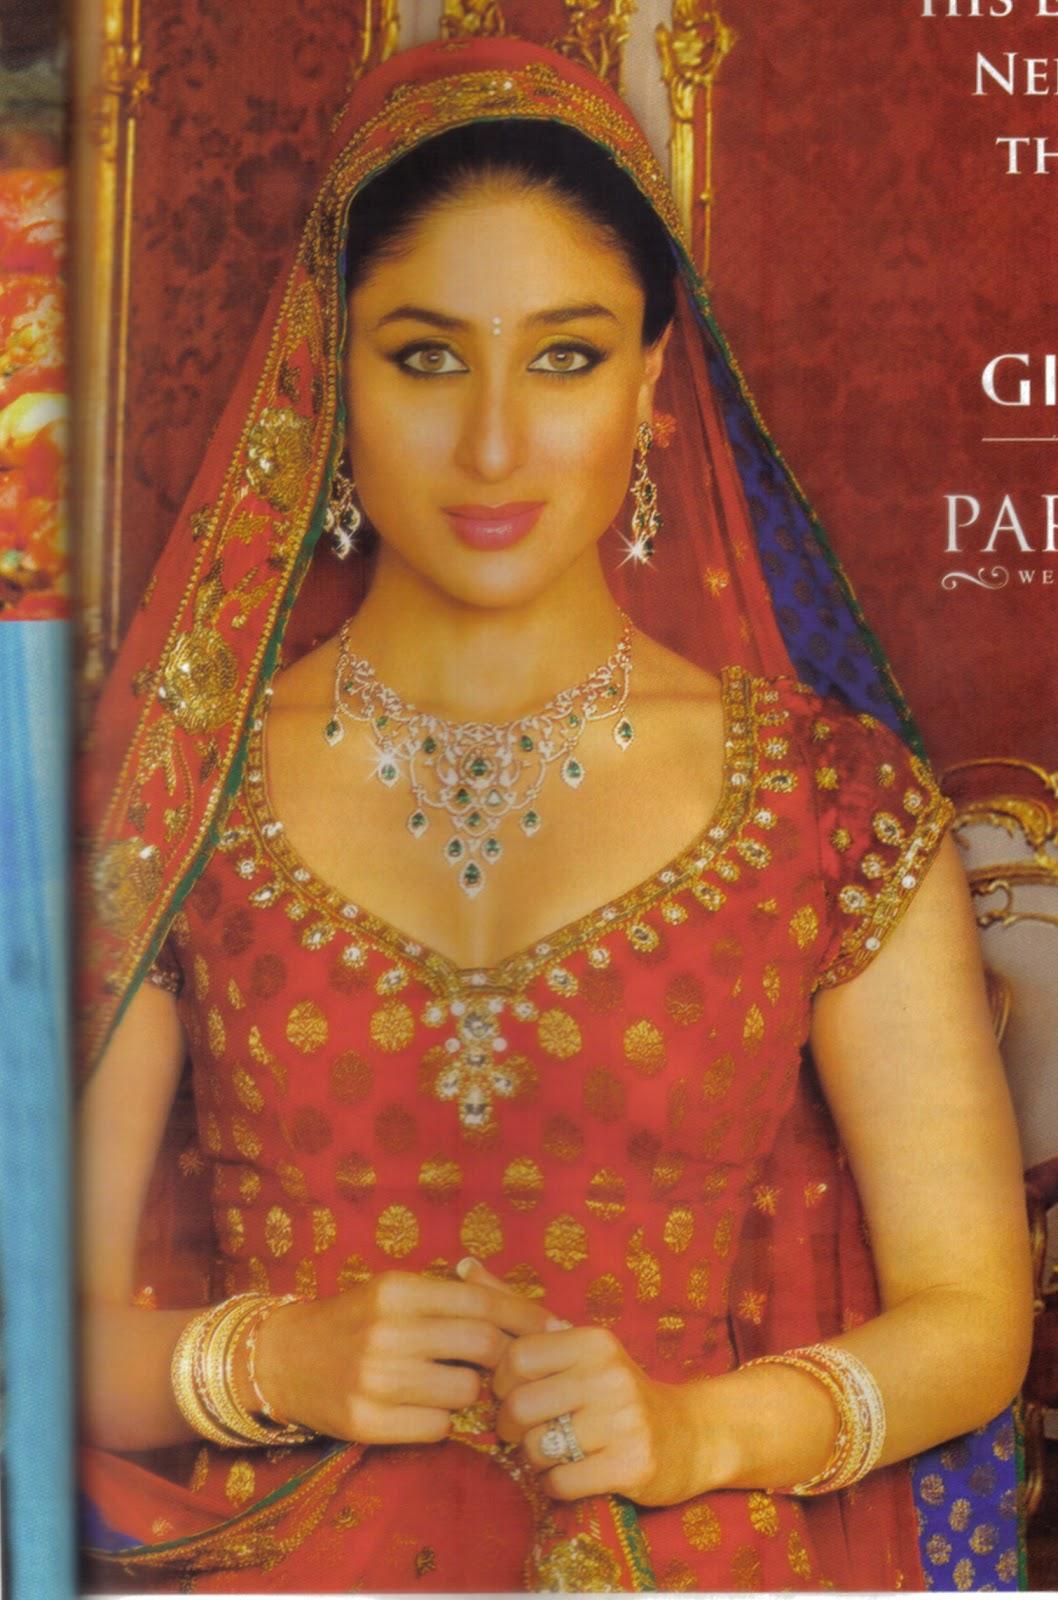 Movies I Love: Kareena Kapoor - Gallery